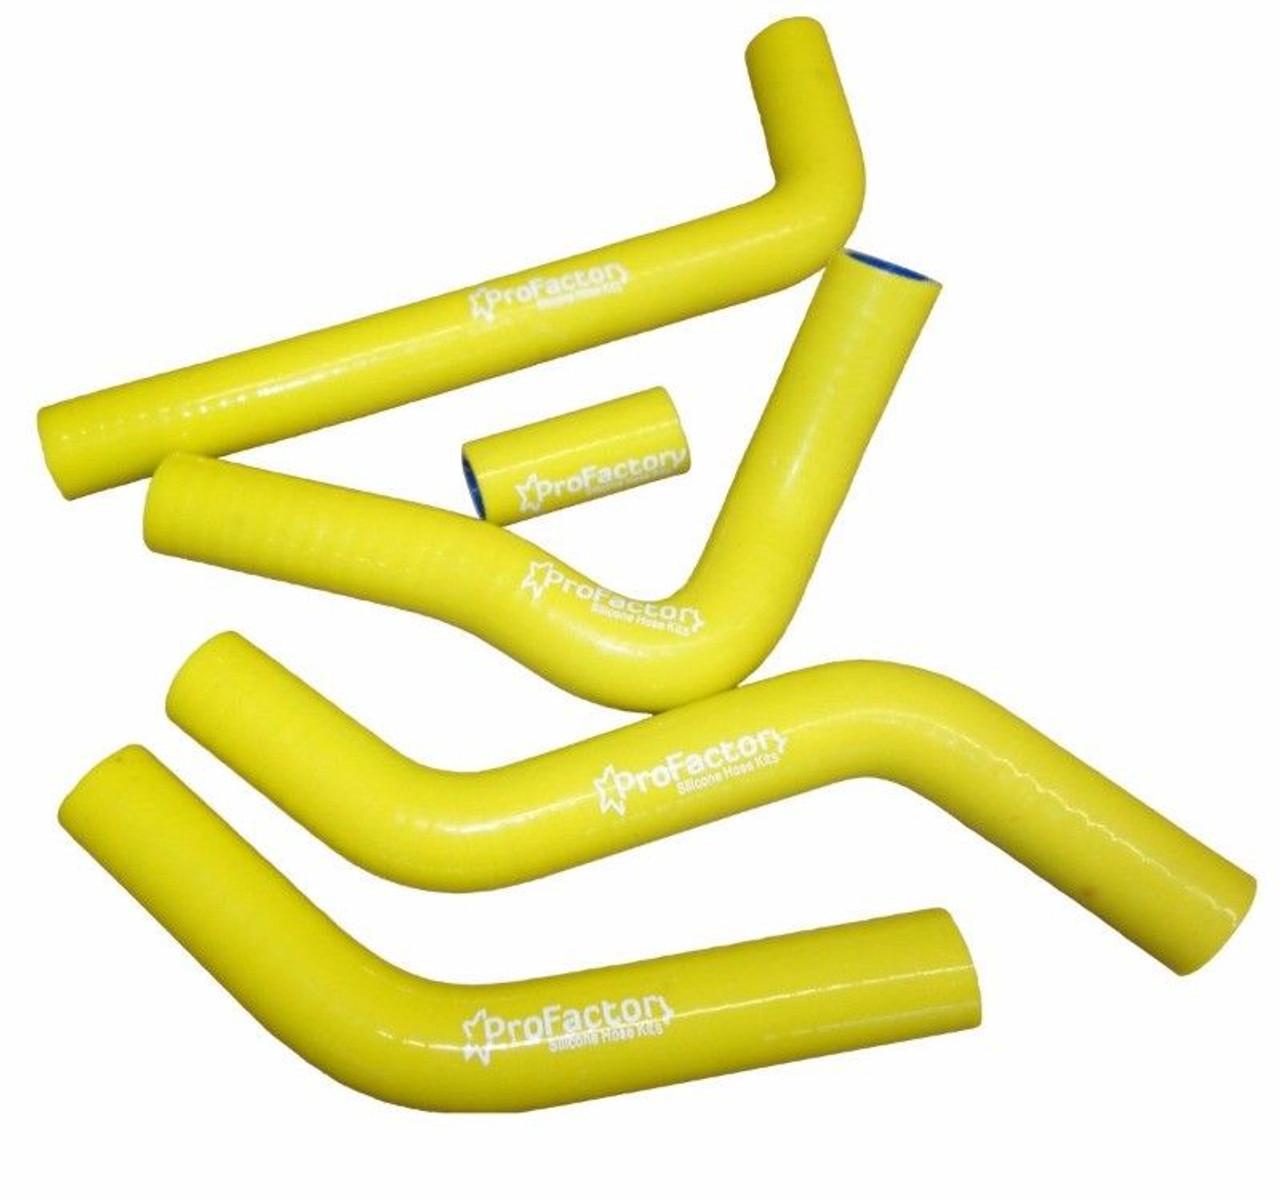 YELLOW Silicone radiator hose for SUZUKI RMZ450 RMZ 450 2005 05